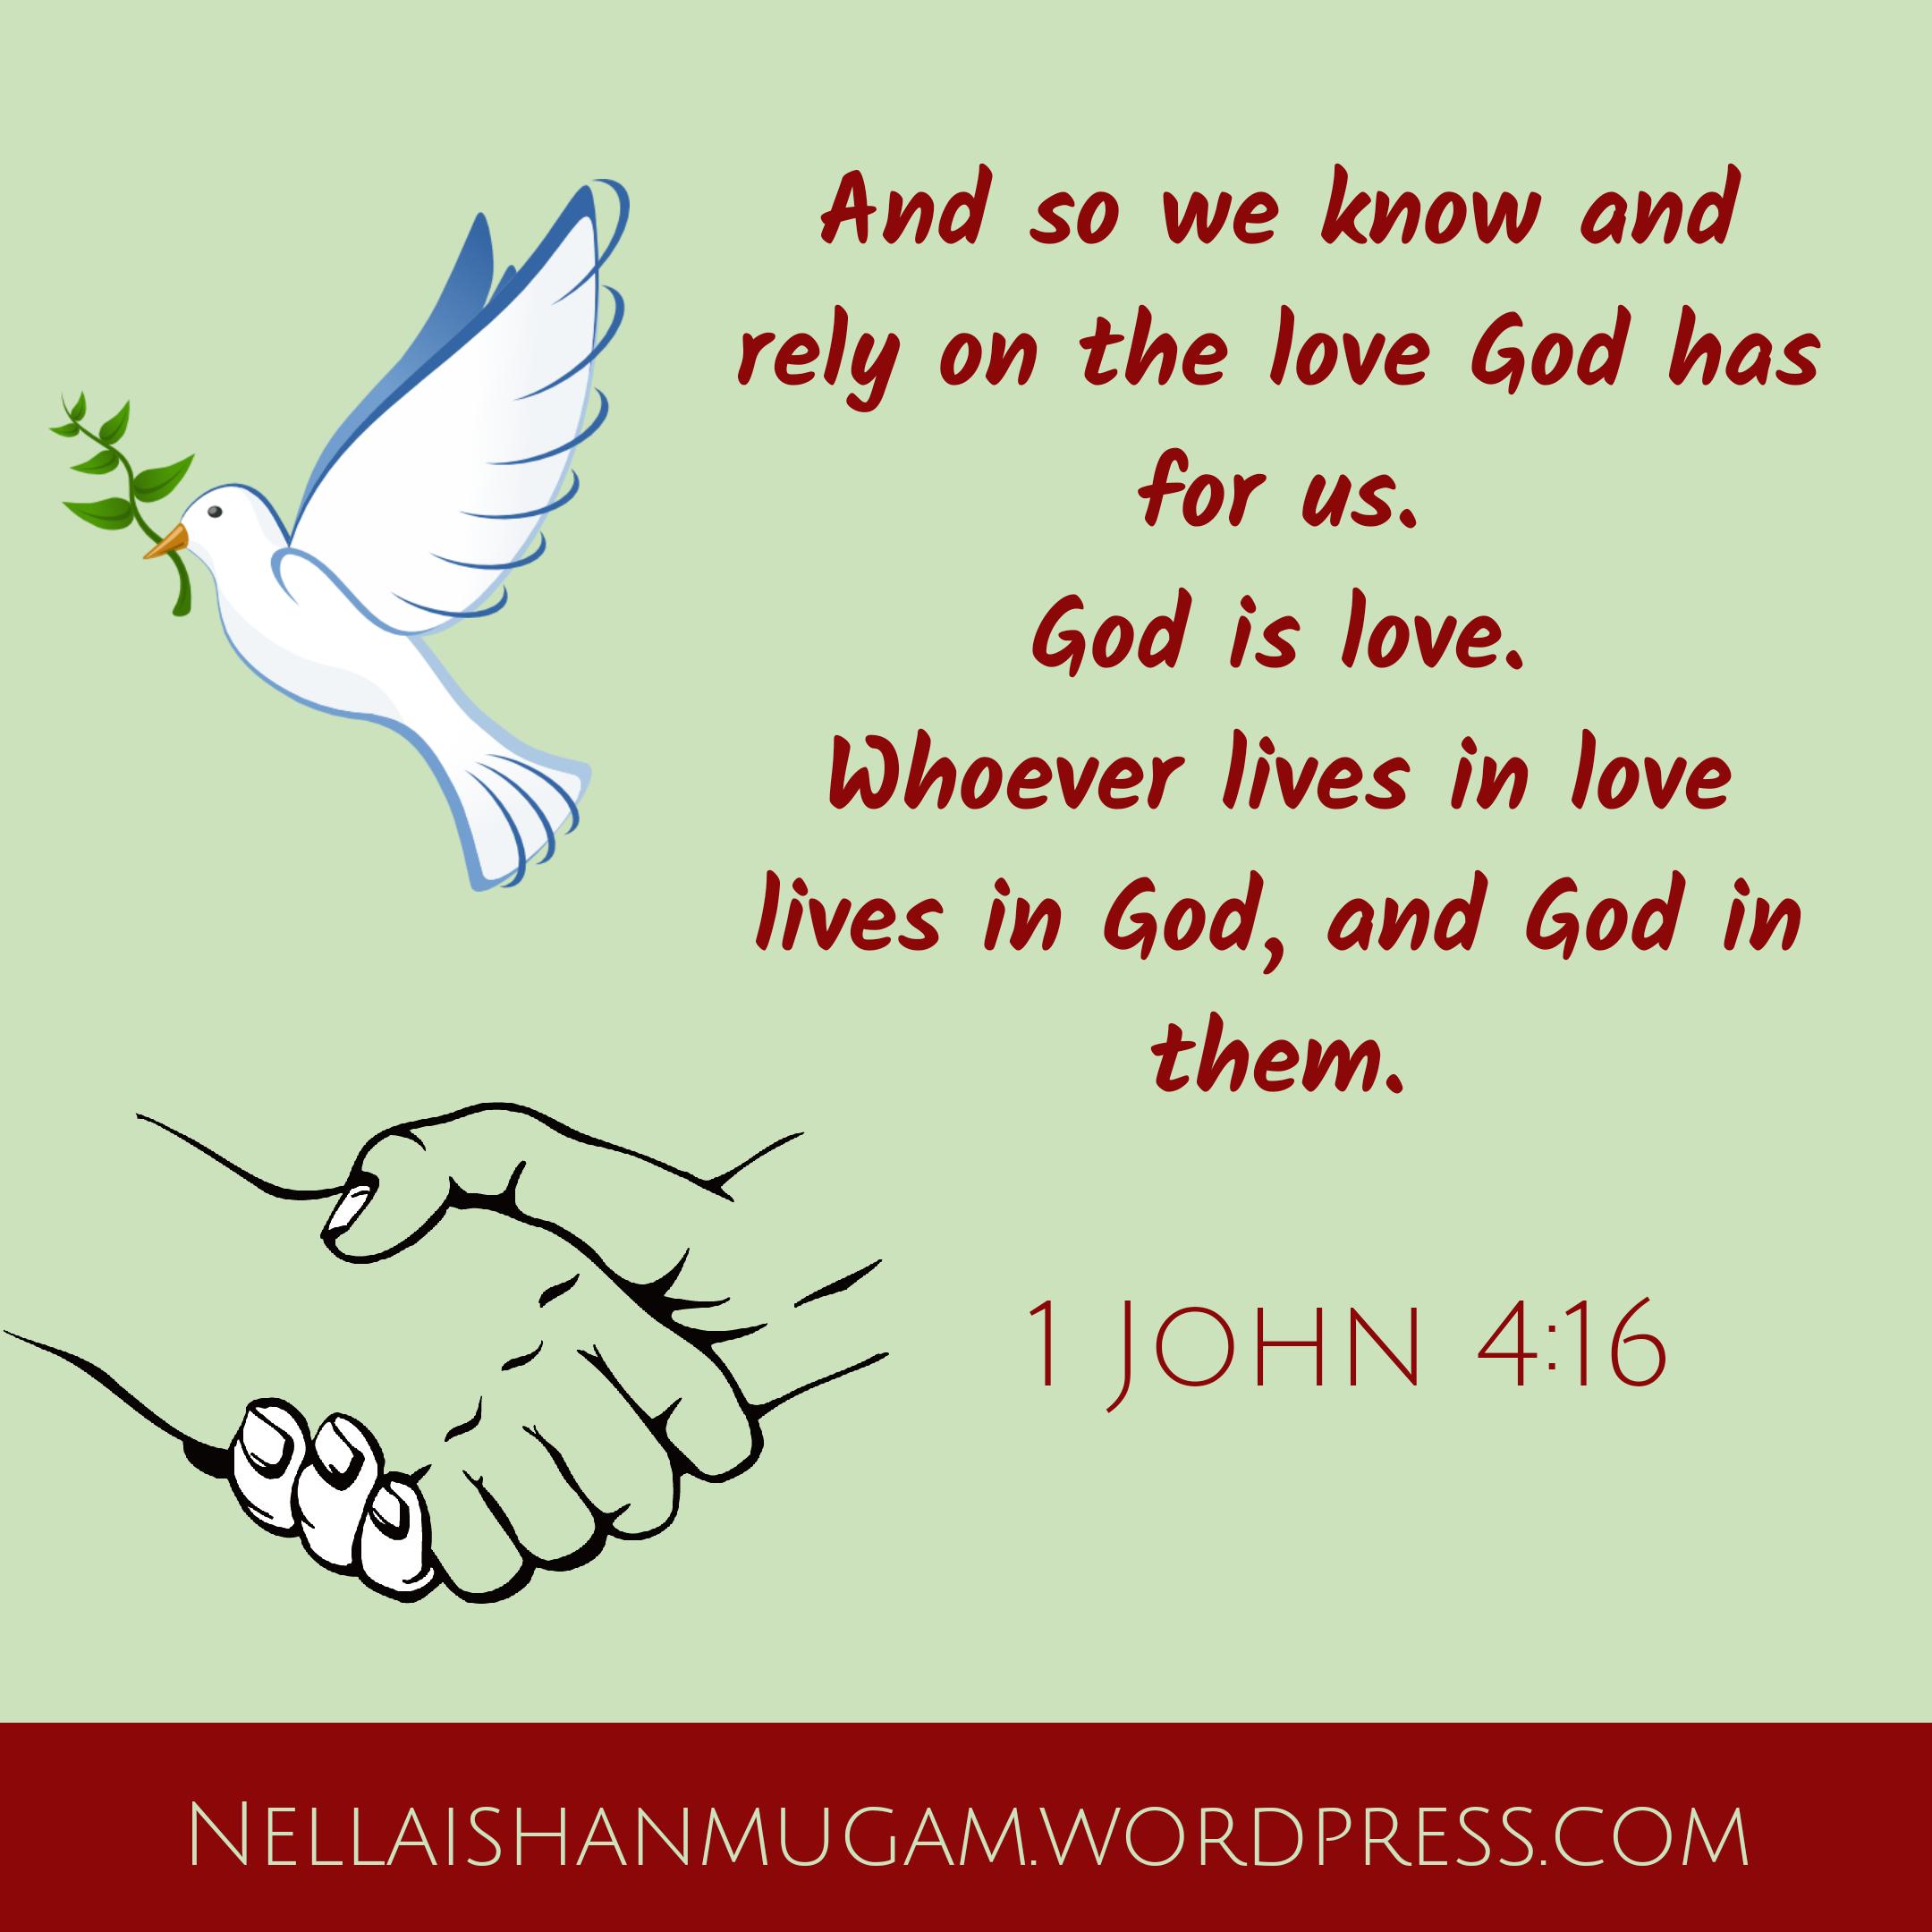 Bible verse regarding love - 1 John 4:16